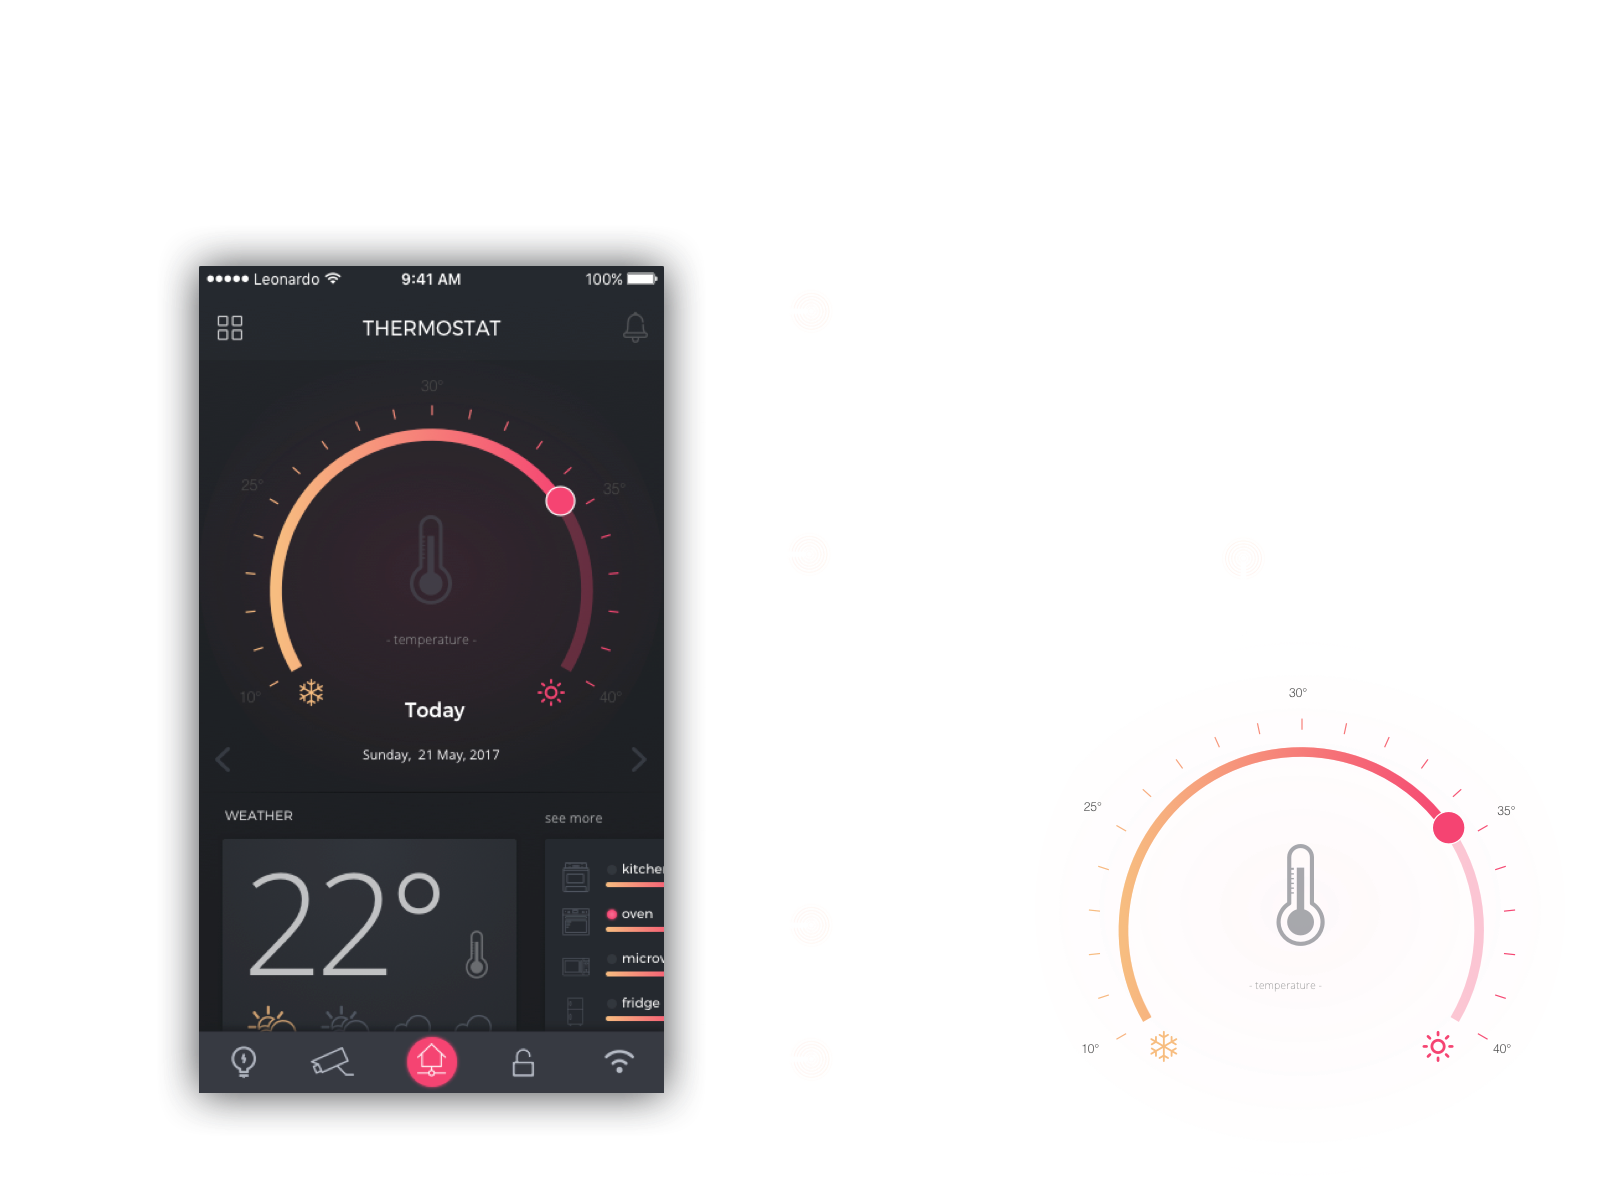 02 thermostat